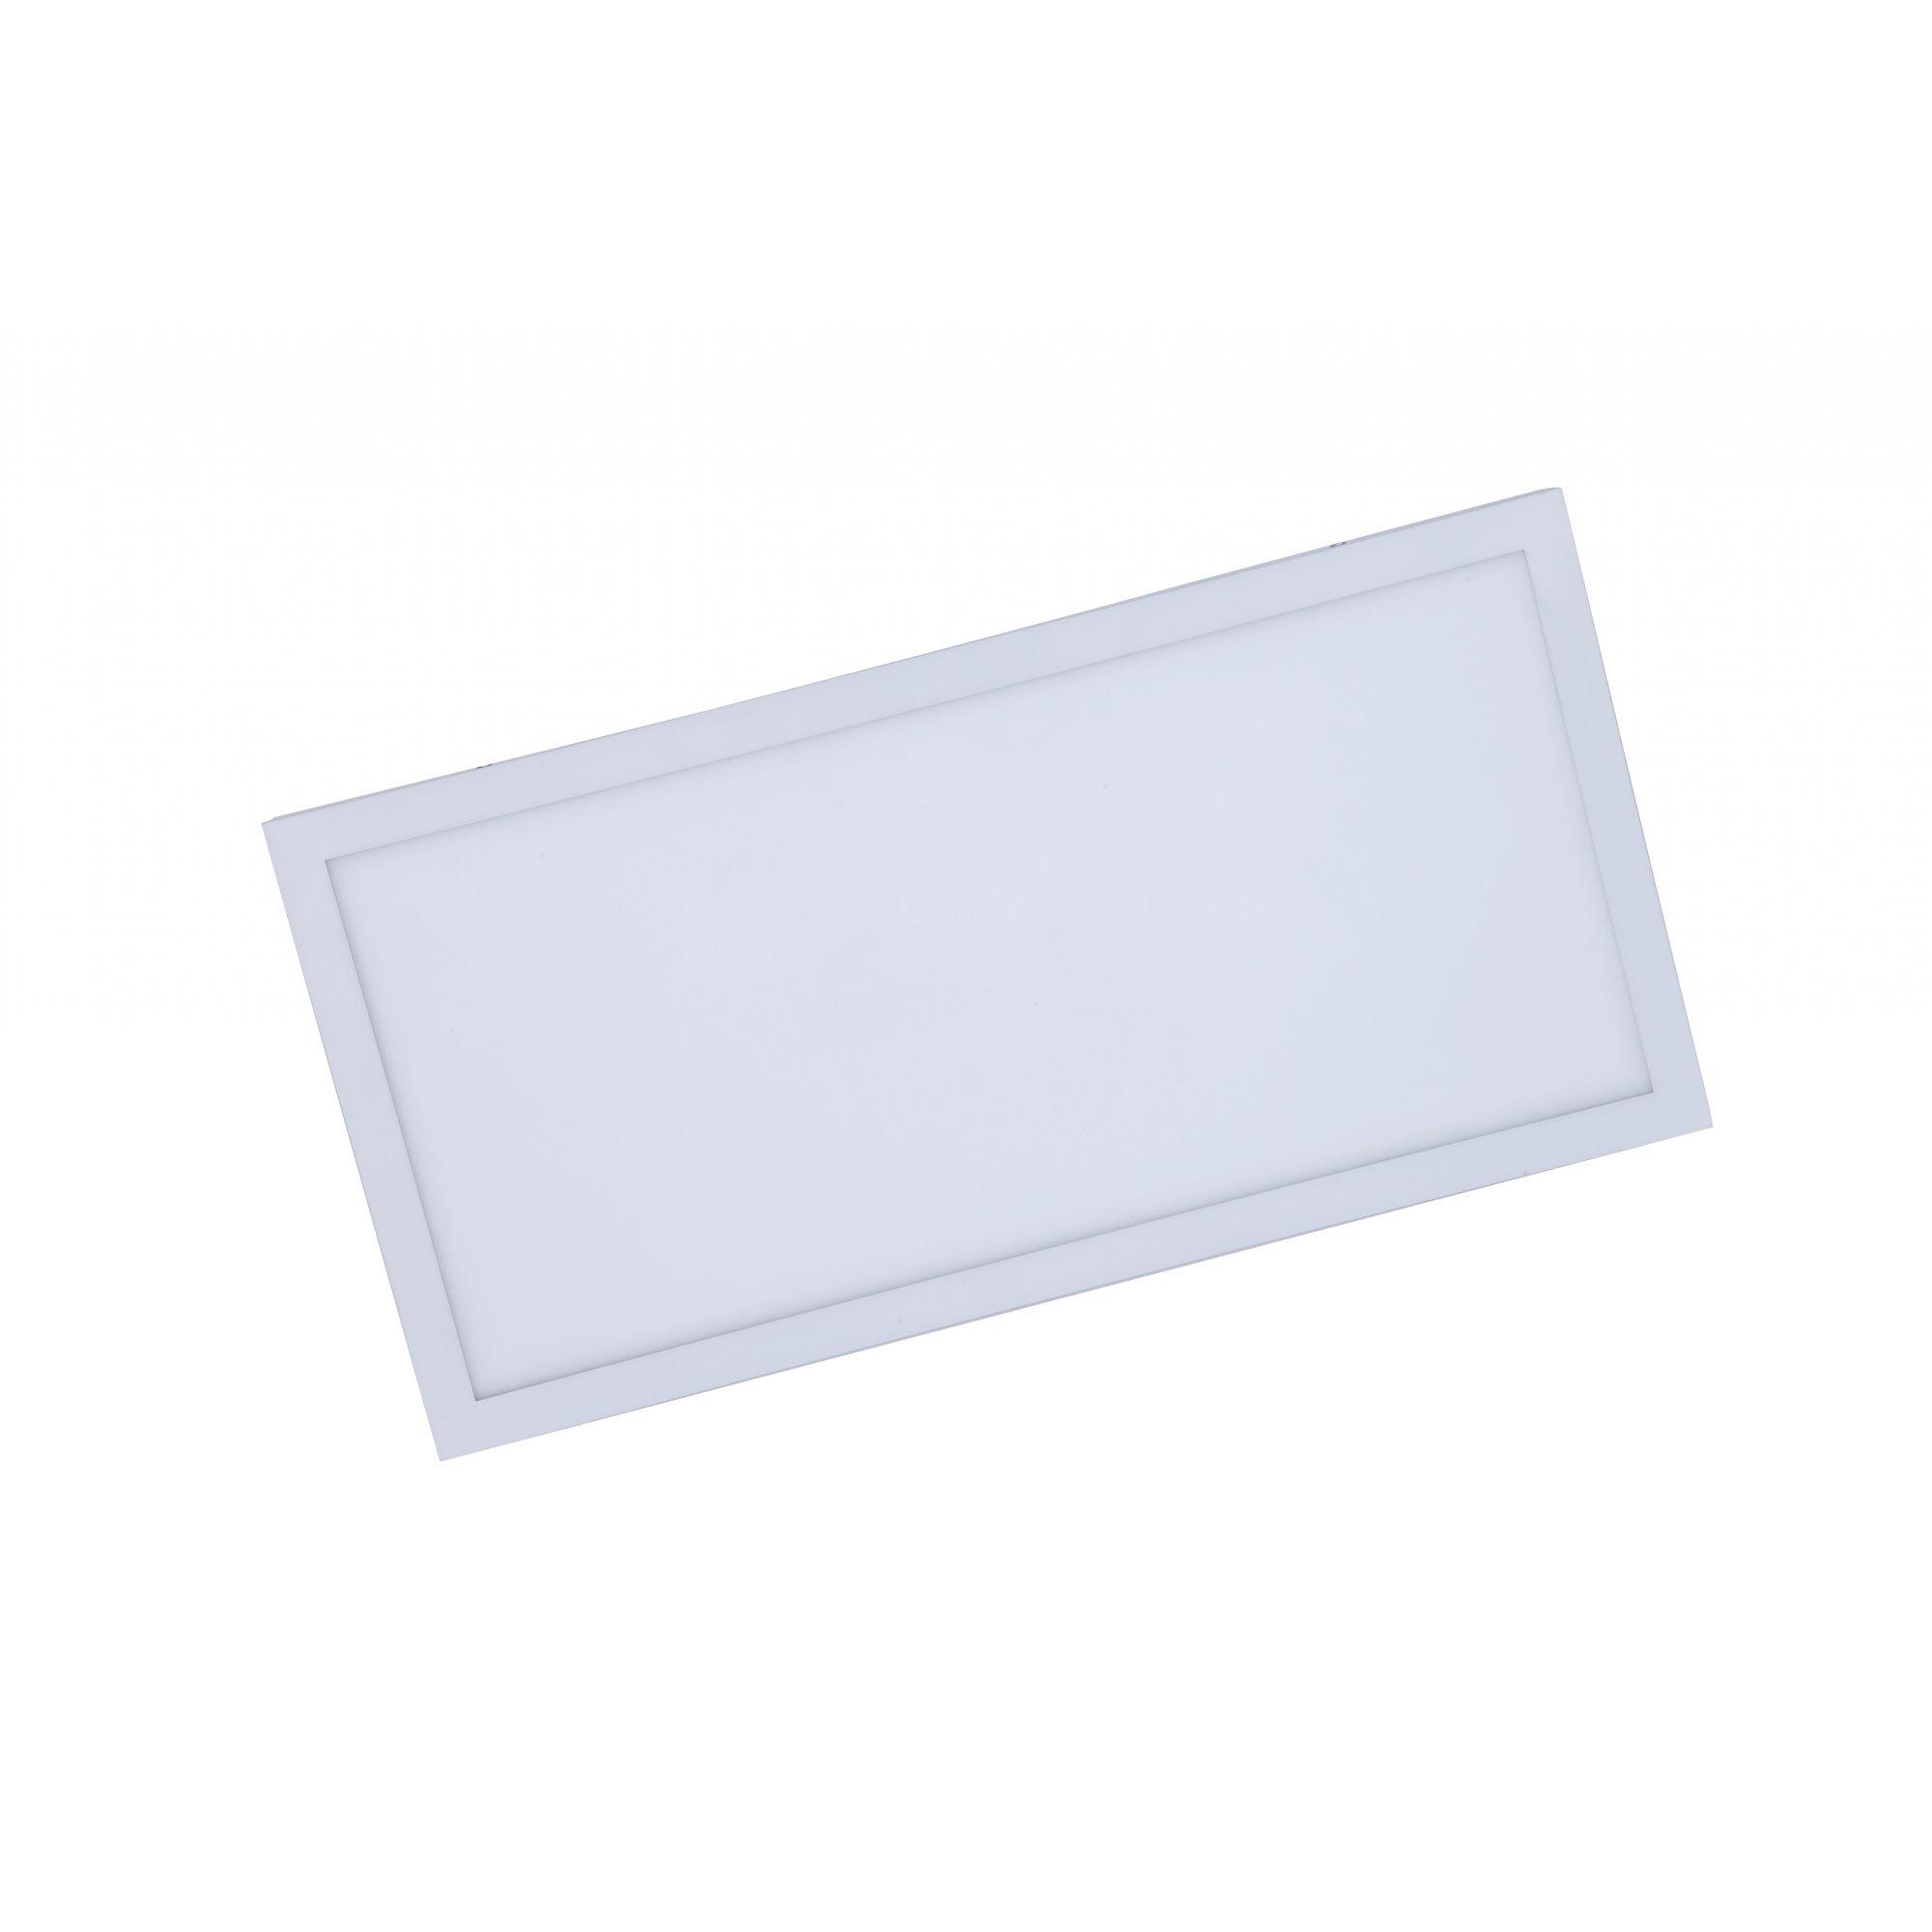 Painel Dimerizavel de sobrepor 30W (30x60 cm)